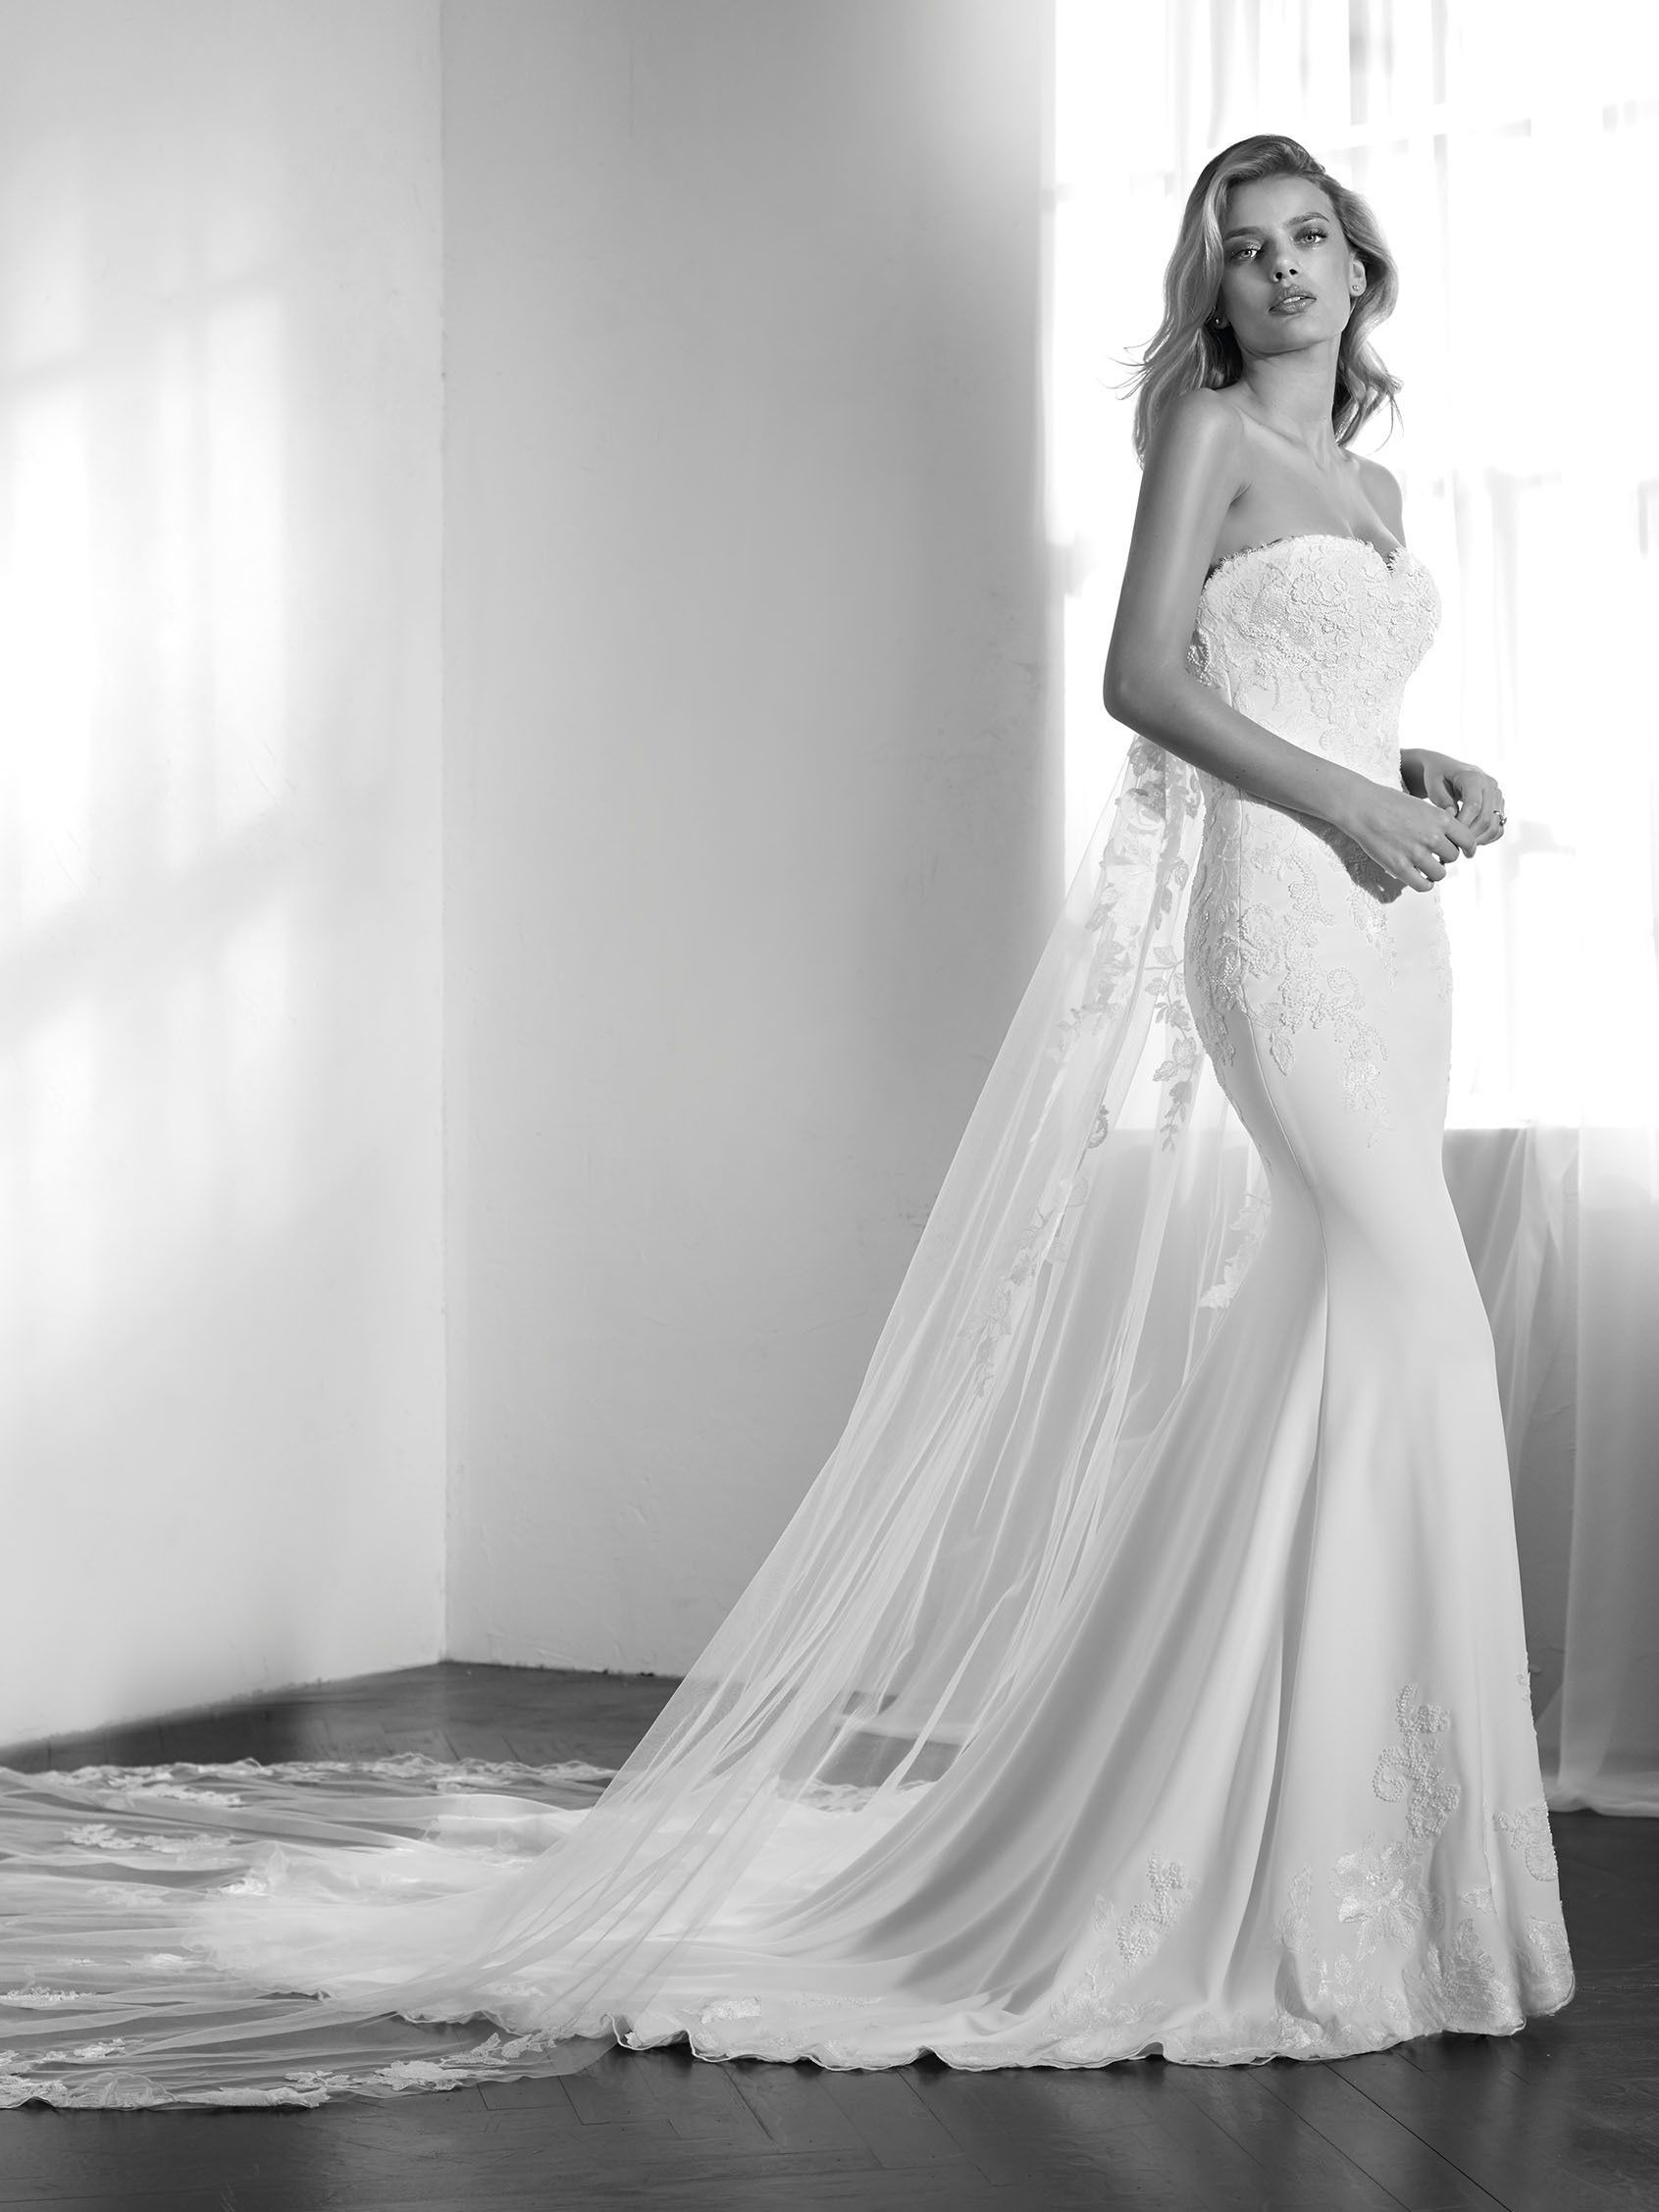 ZAIKAL wedding dress sweetheart neckline   Wedding   Pinterest ...